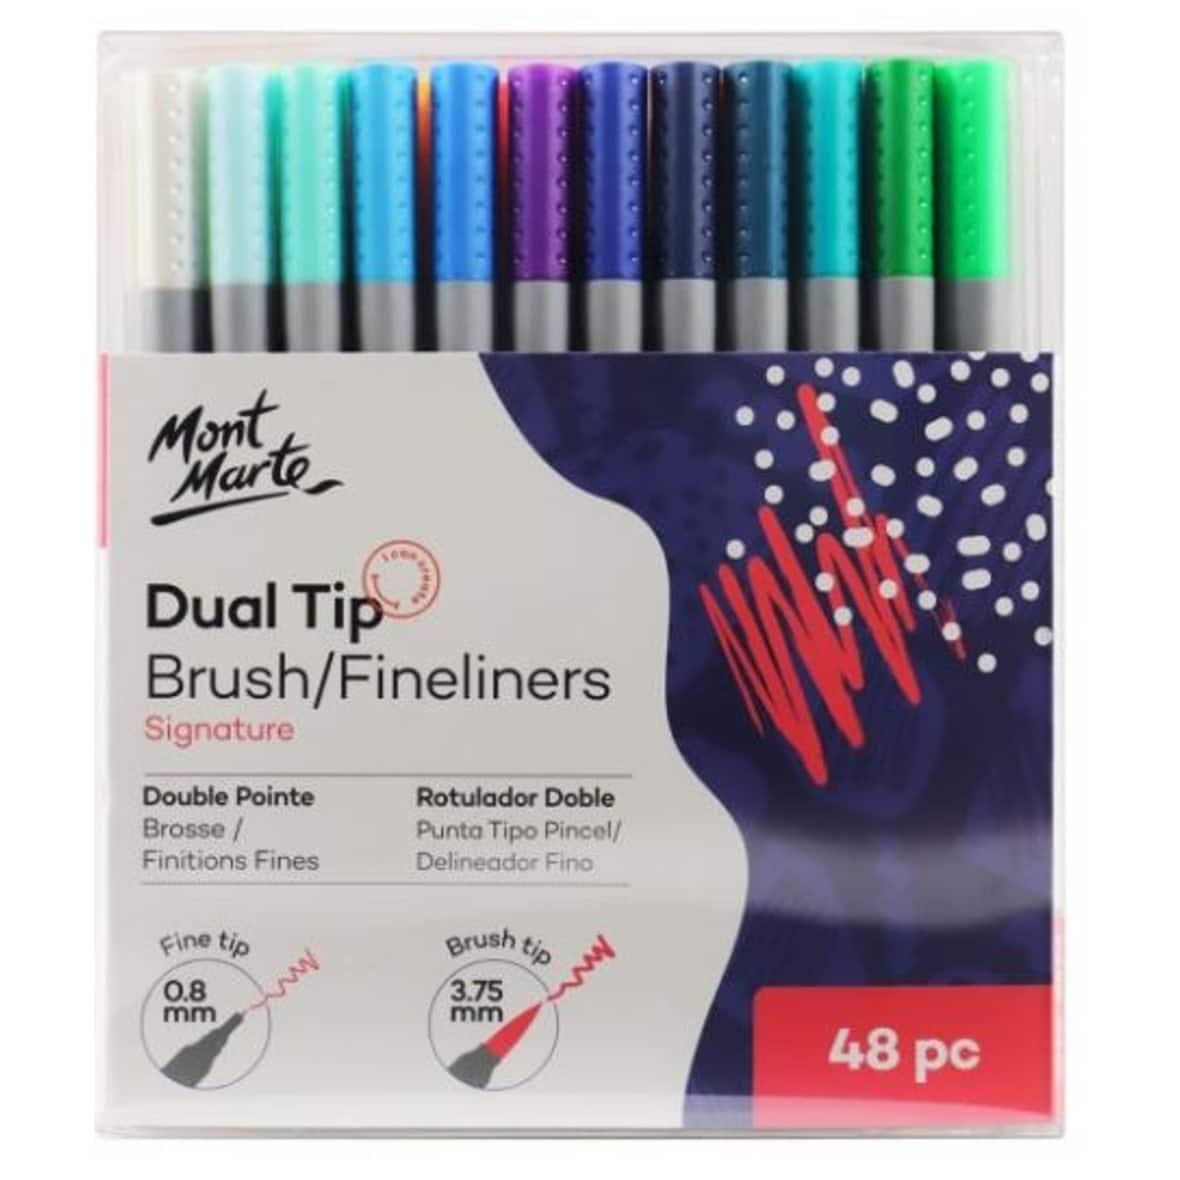 Signature Dual Tip Brush/Fineliners 48pc